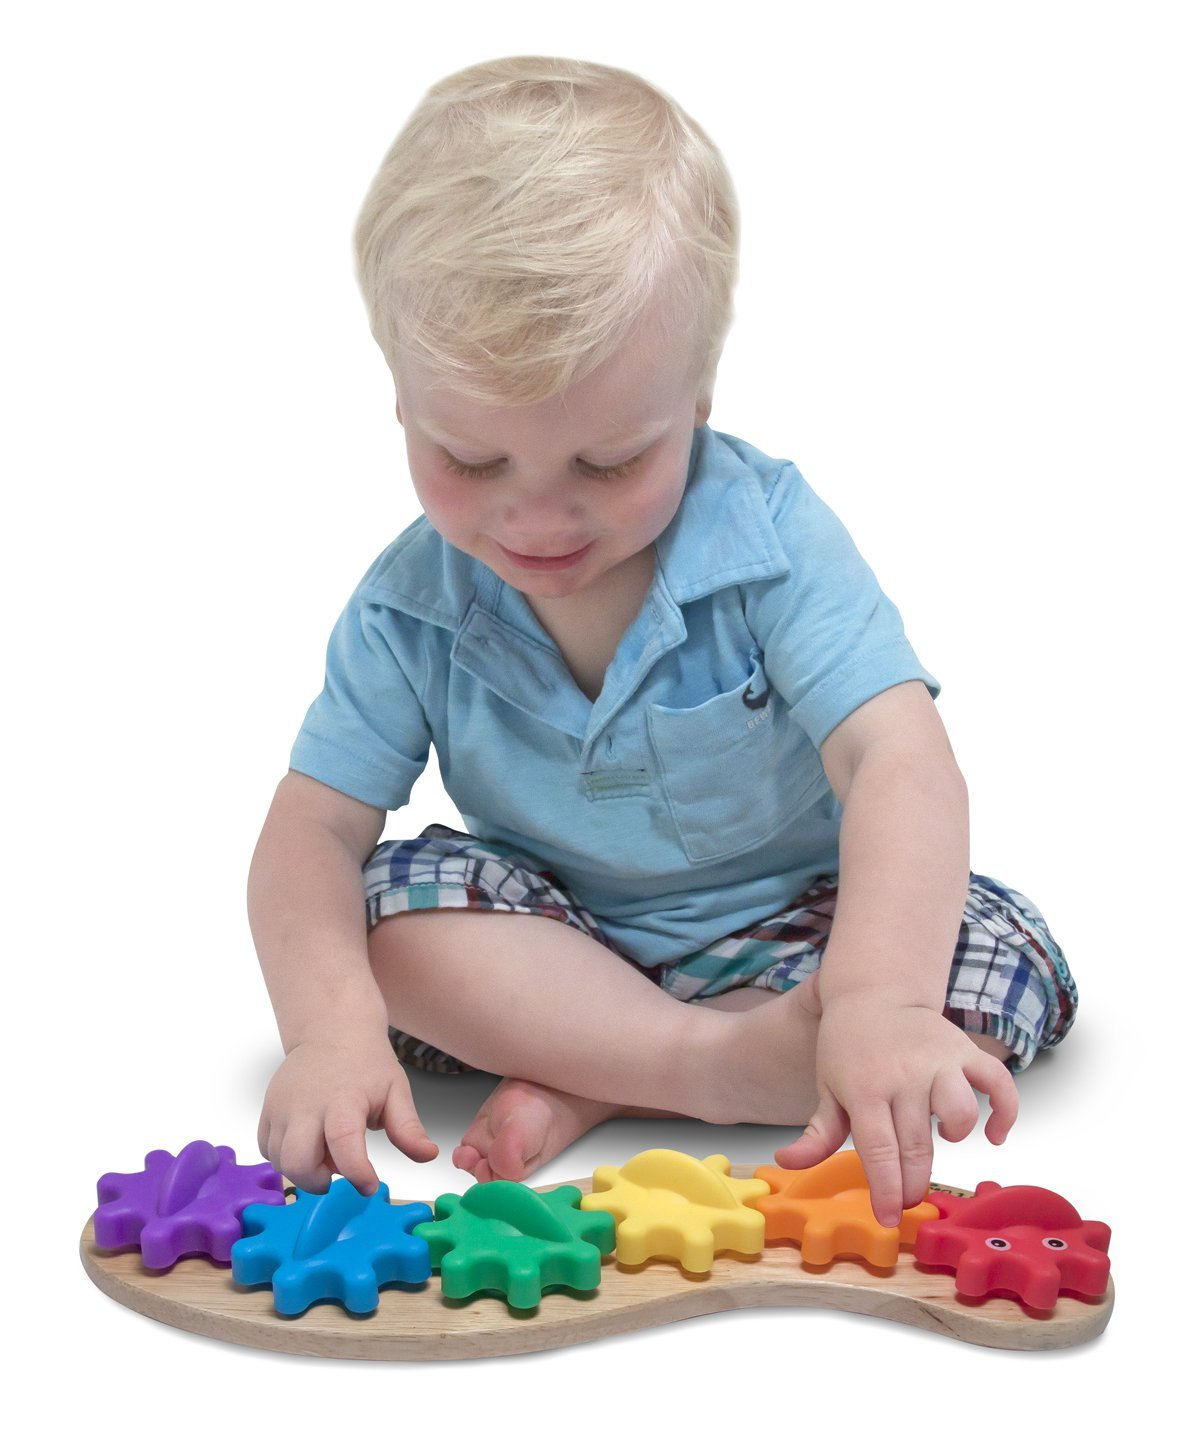 Rainbow Caterpillar Gear Puzzle